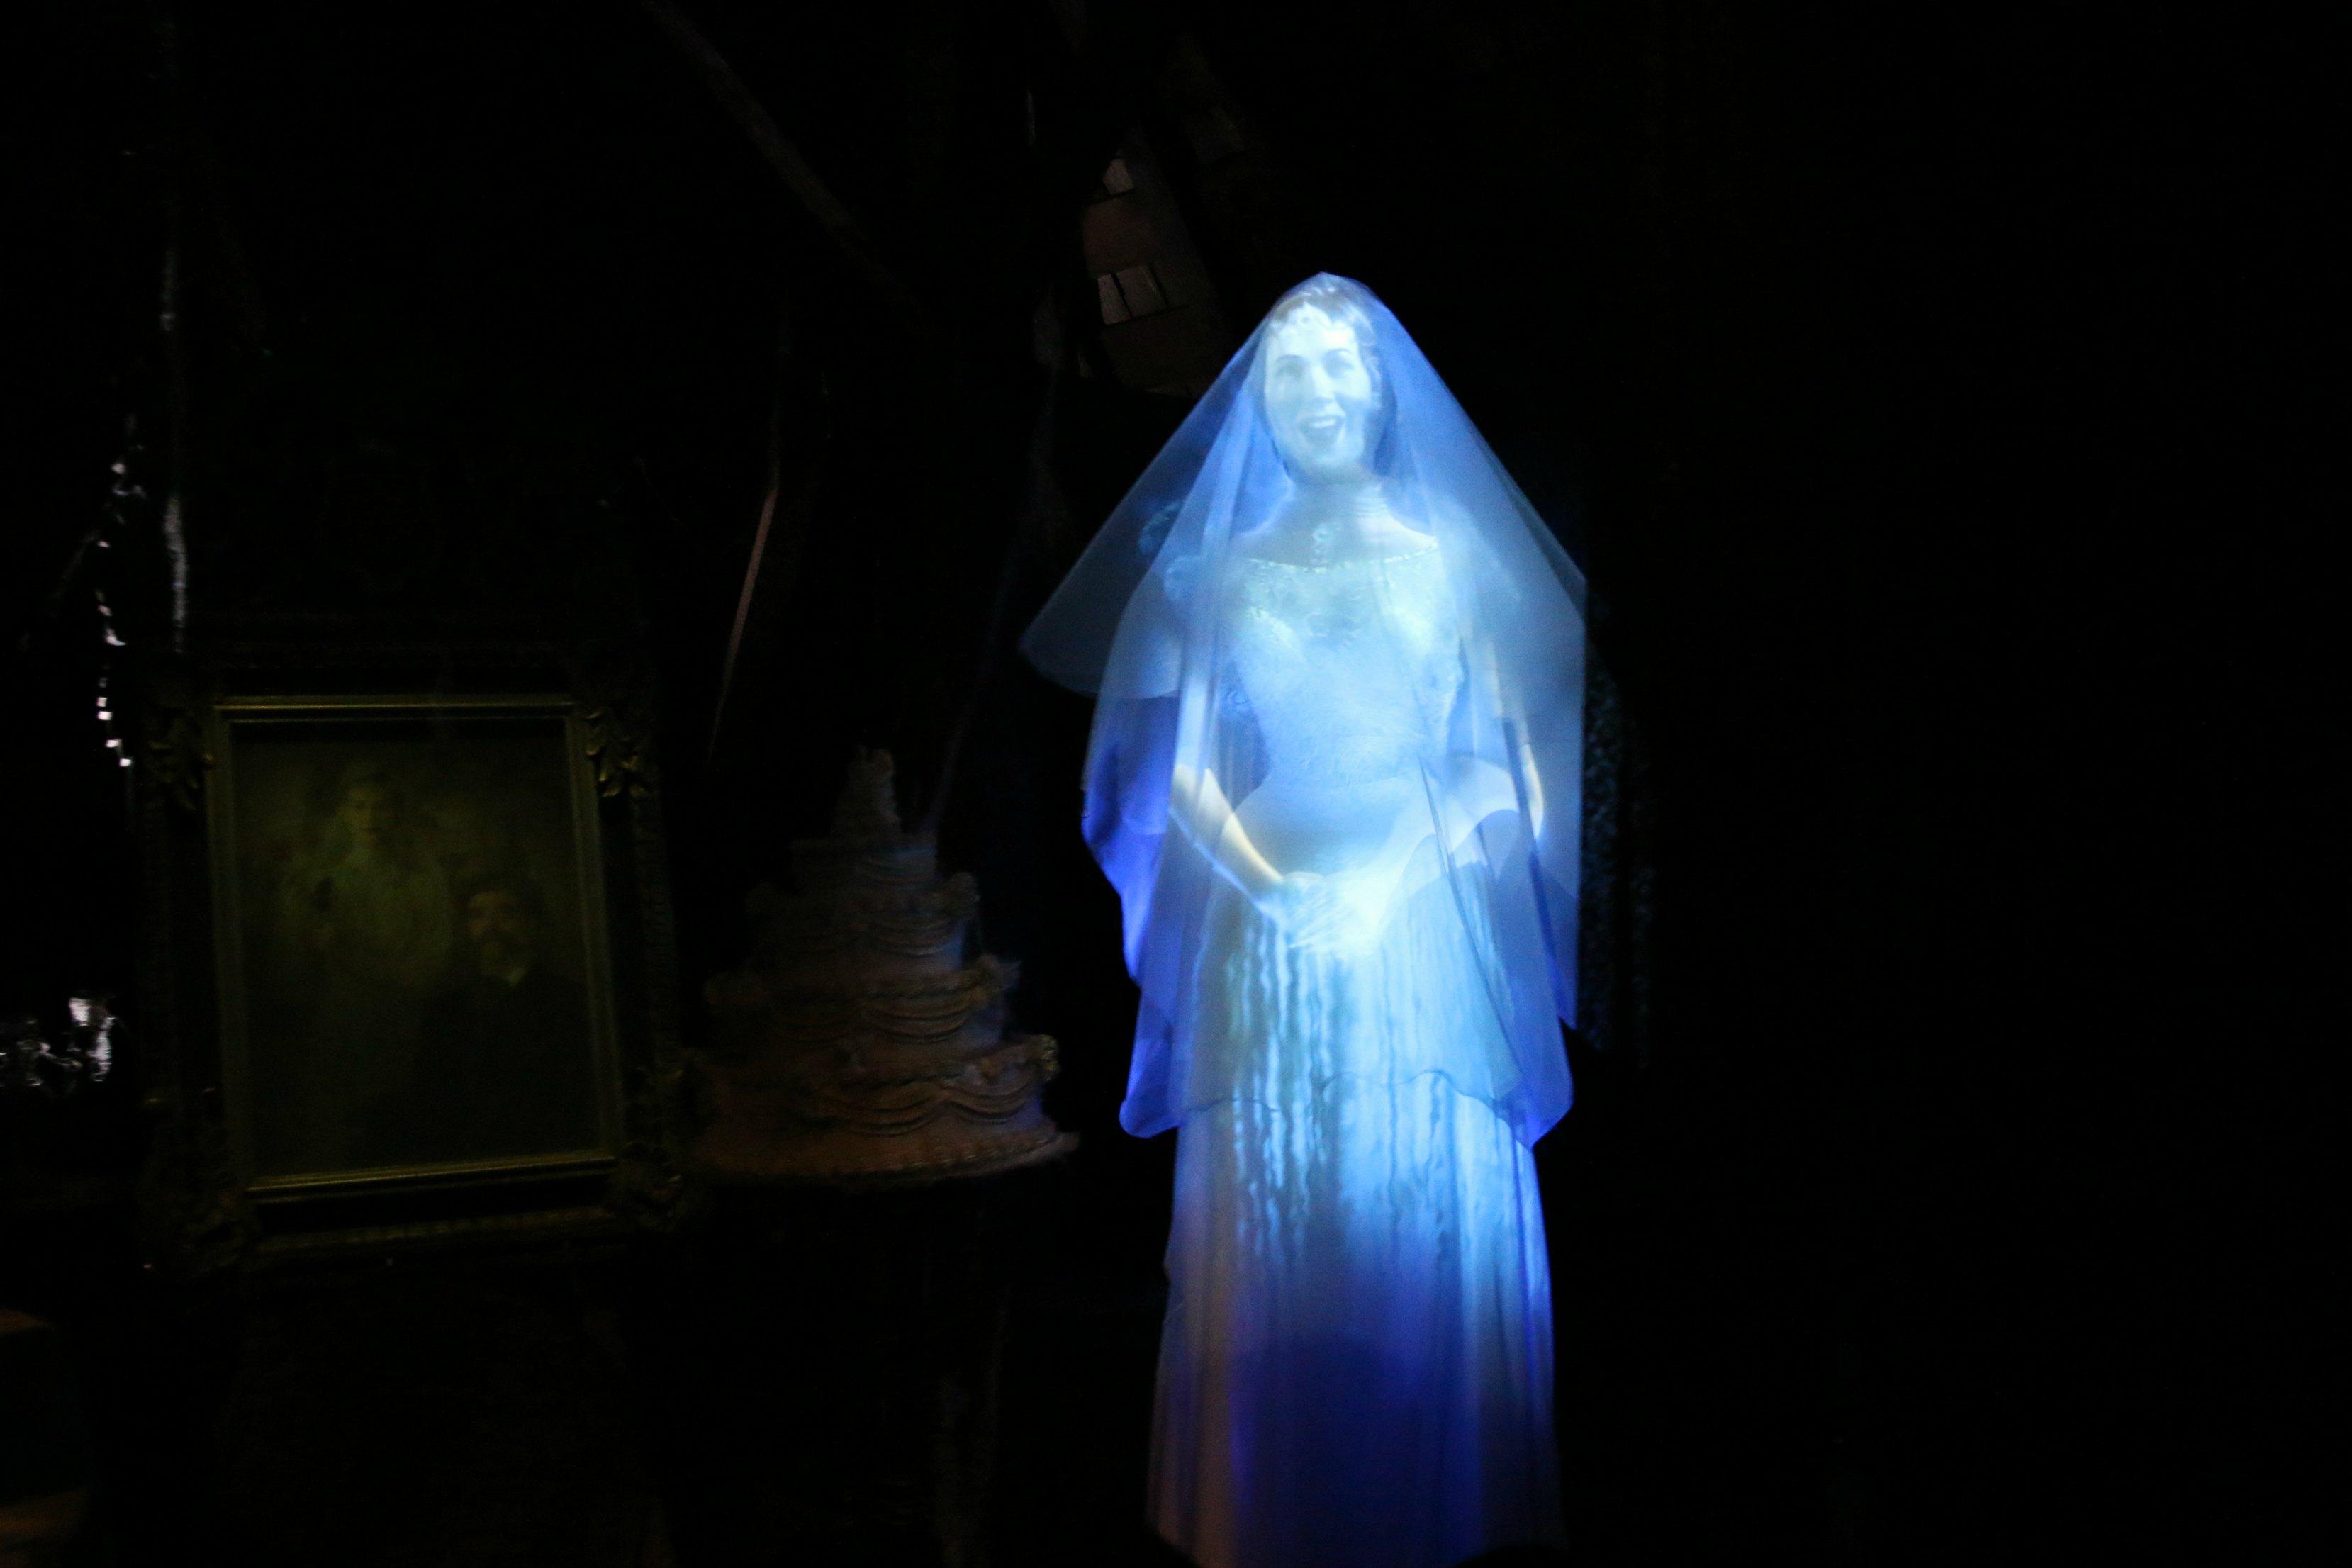 Disneyland ghost